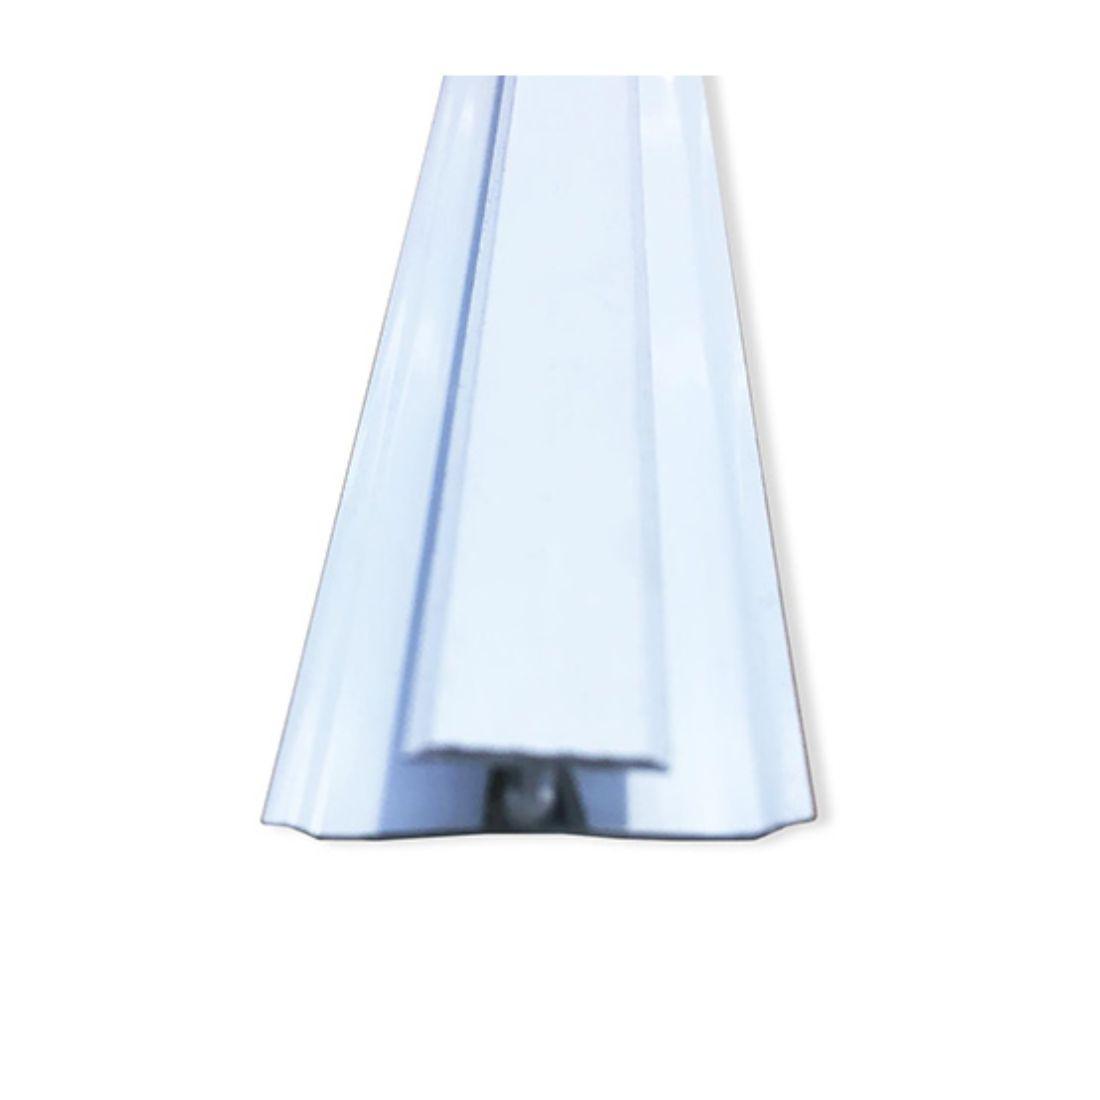 PVC Jointer 12.5 x 2400mm White